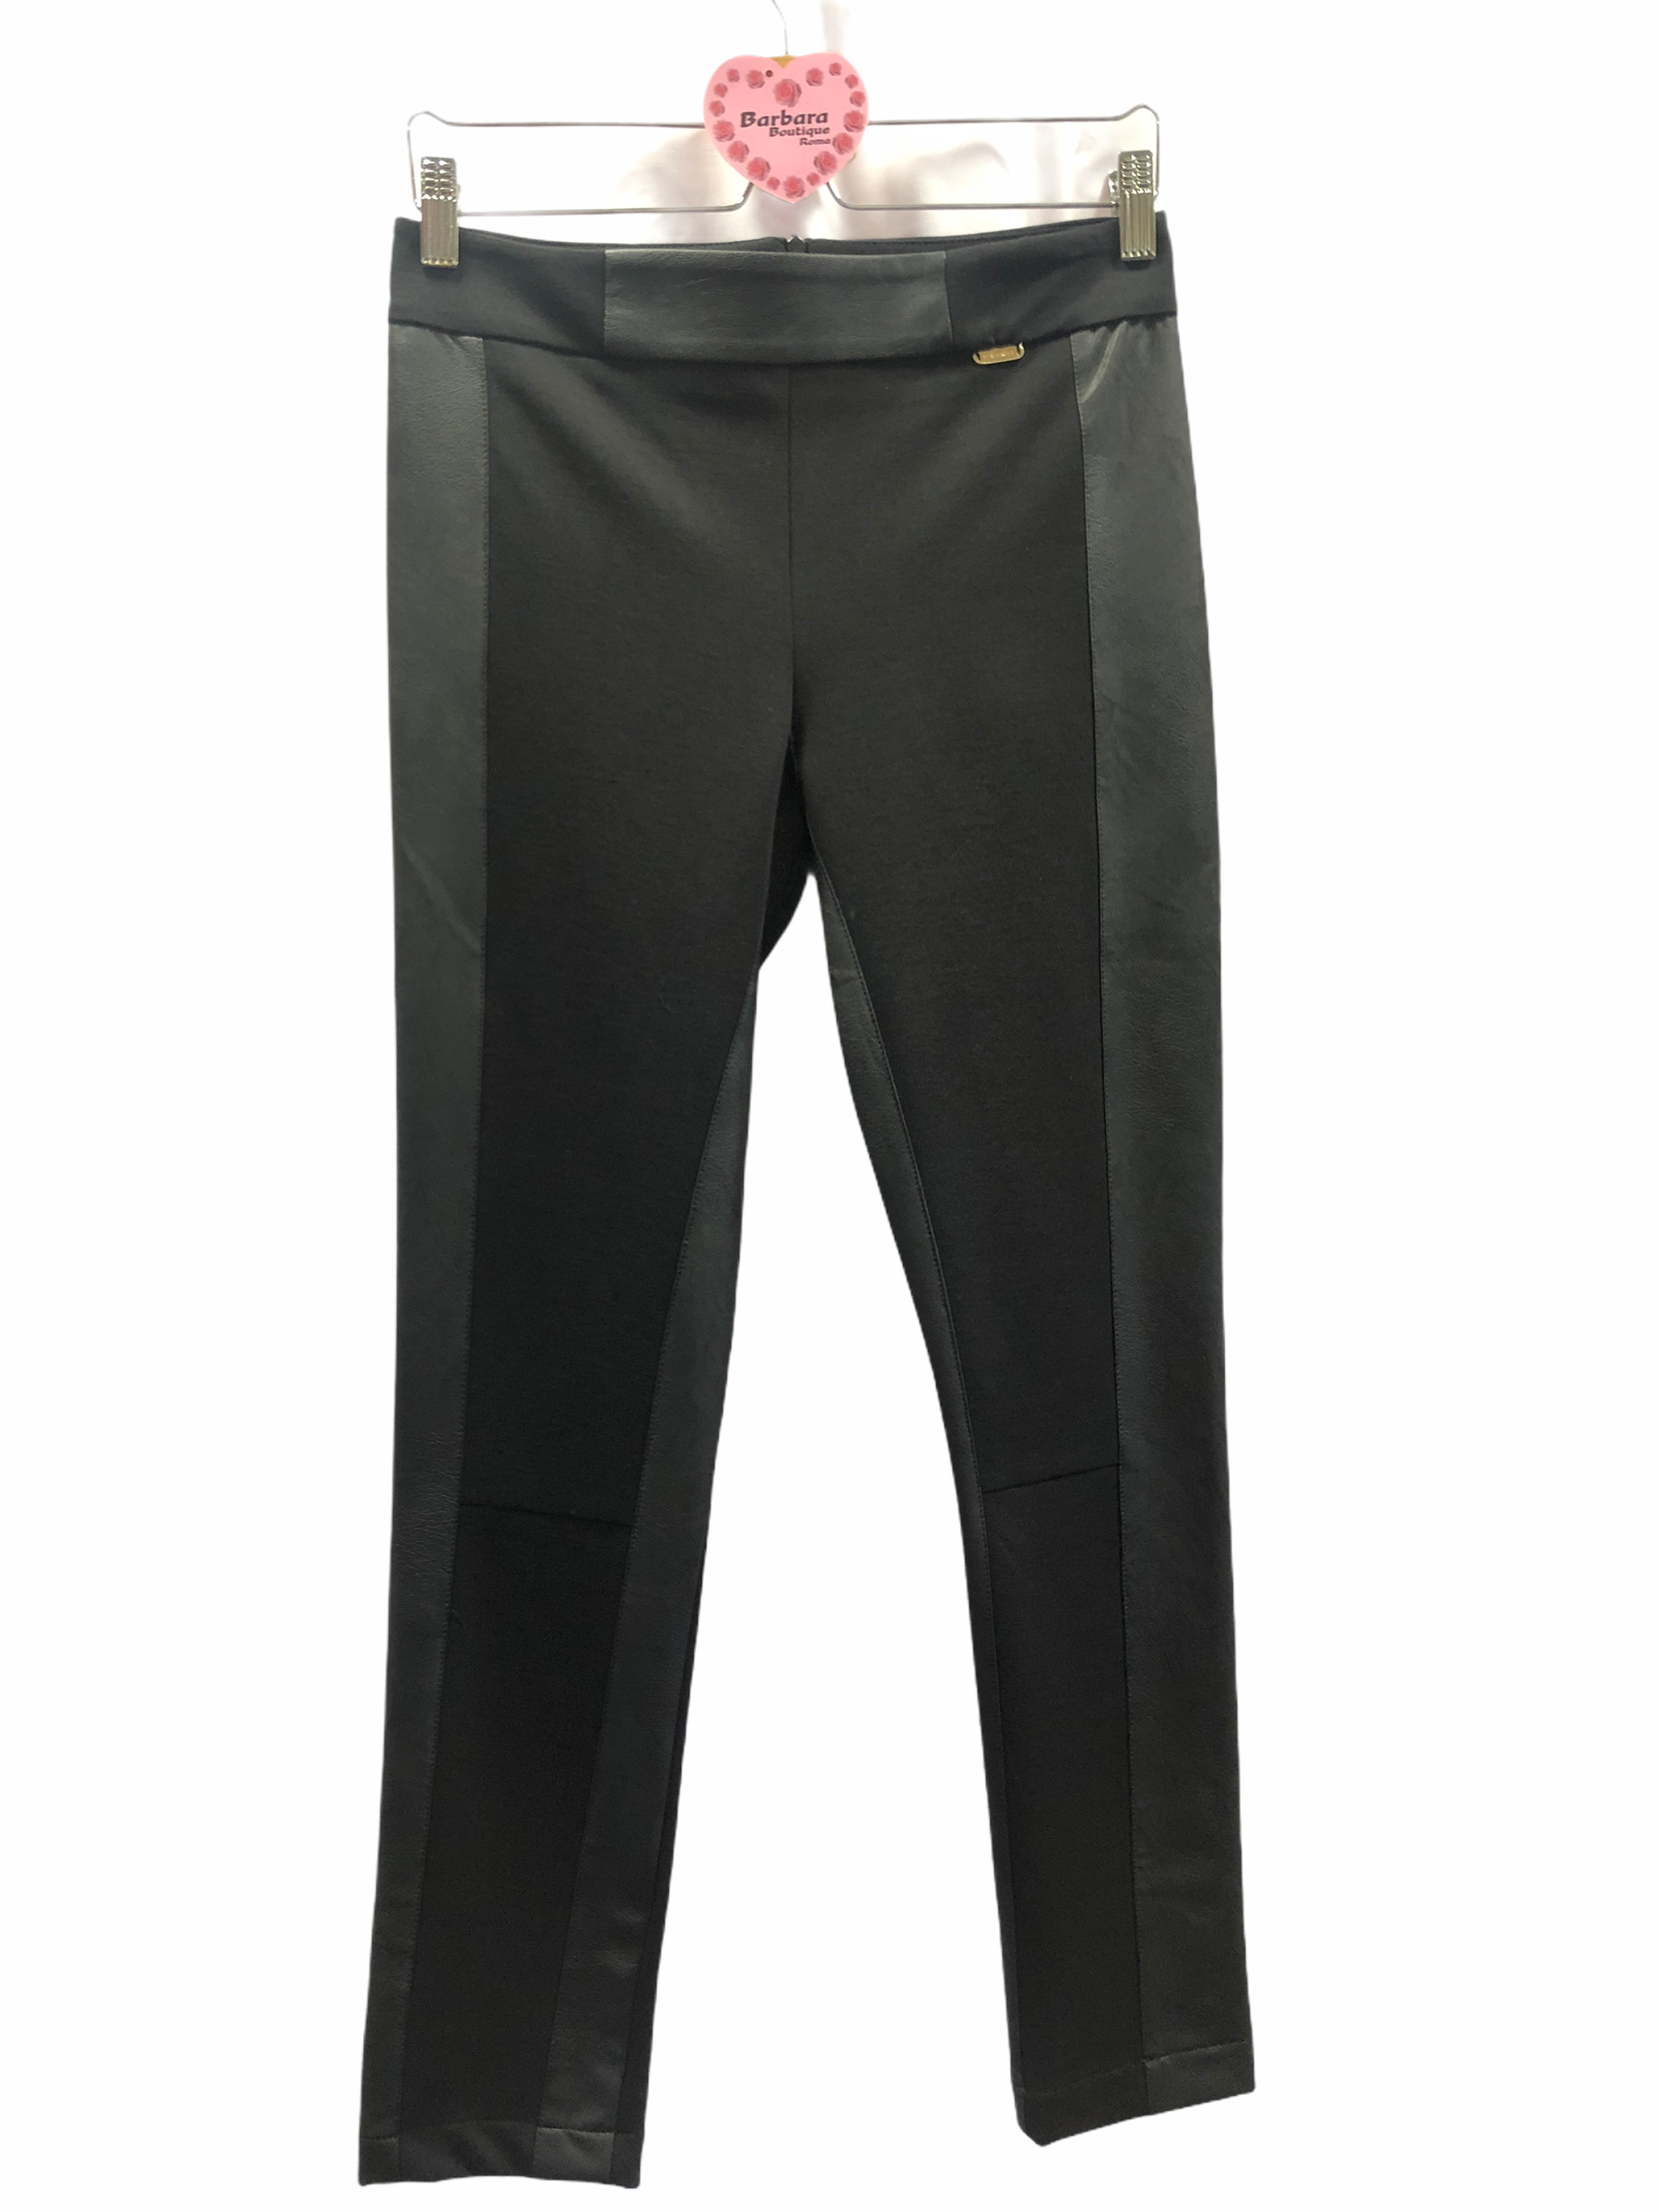 Pantalone profili ecopelle